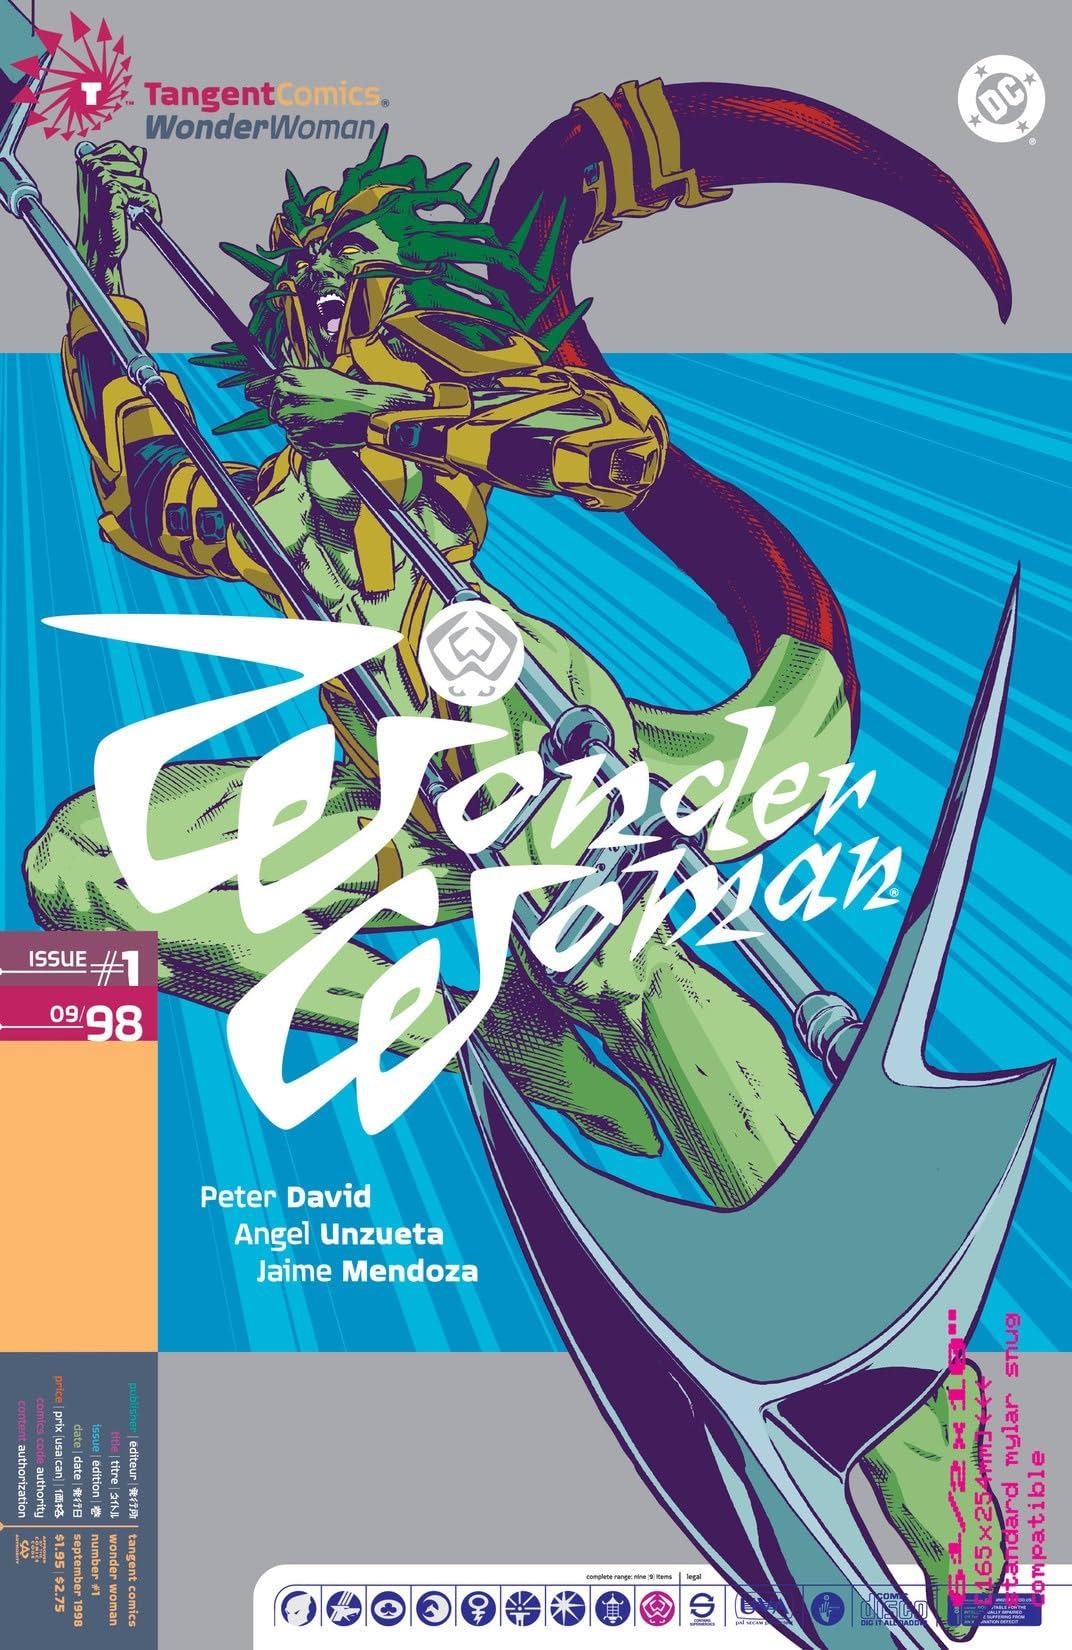 Tangent Comics: Wonder Woman (1998) #1